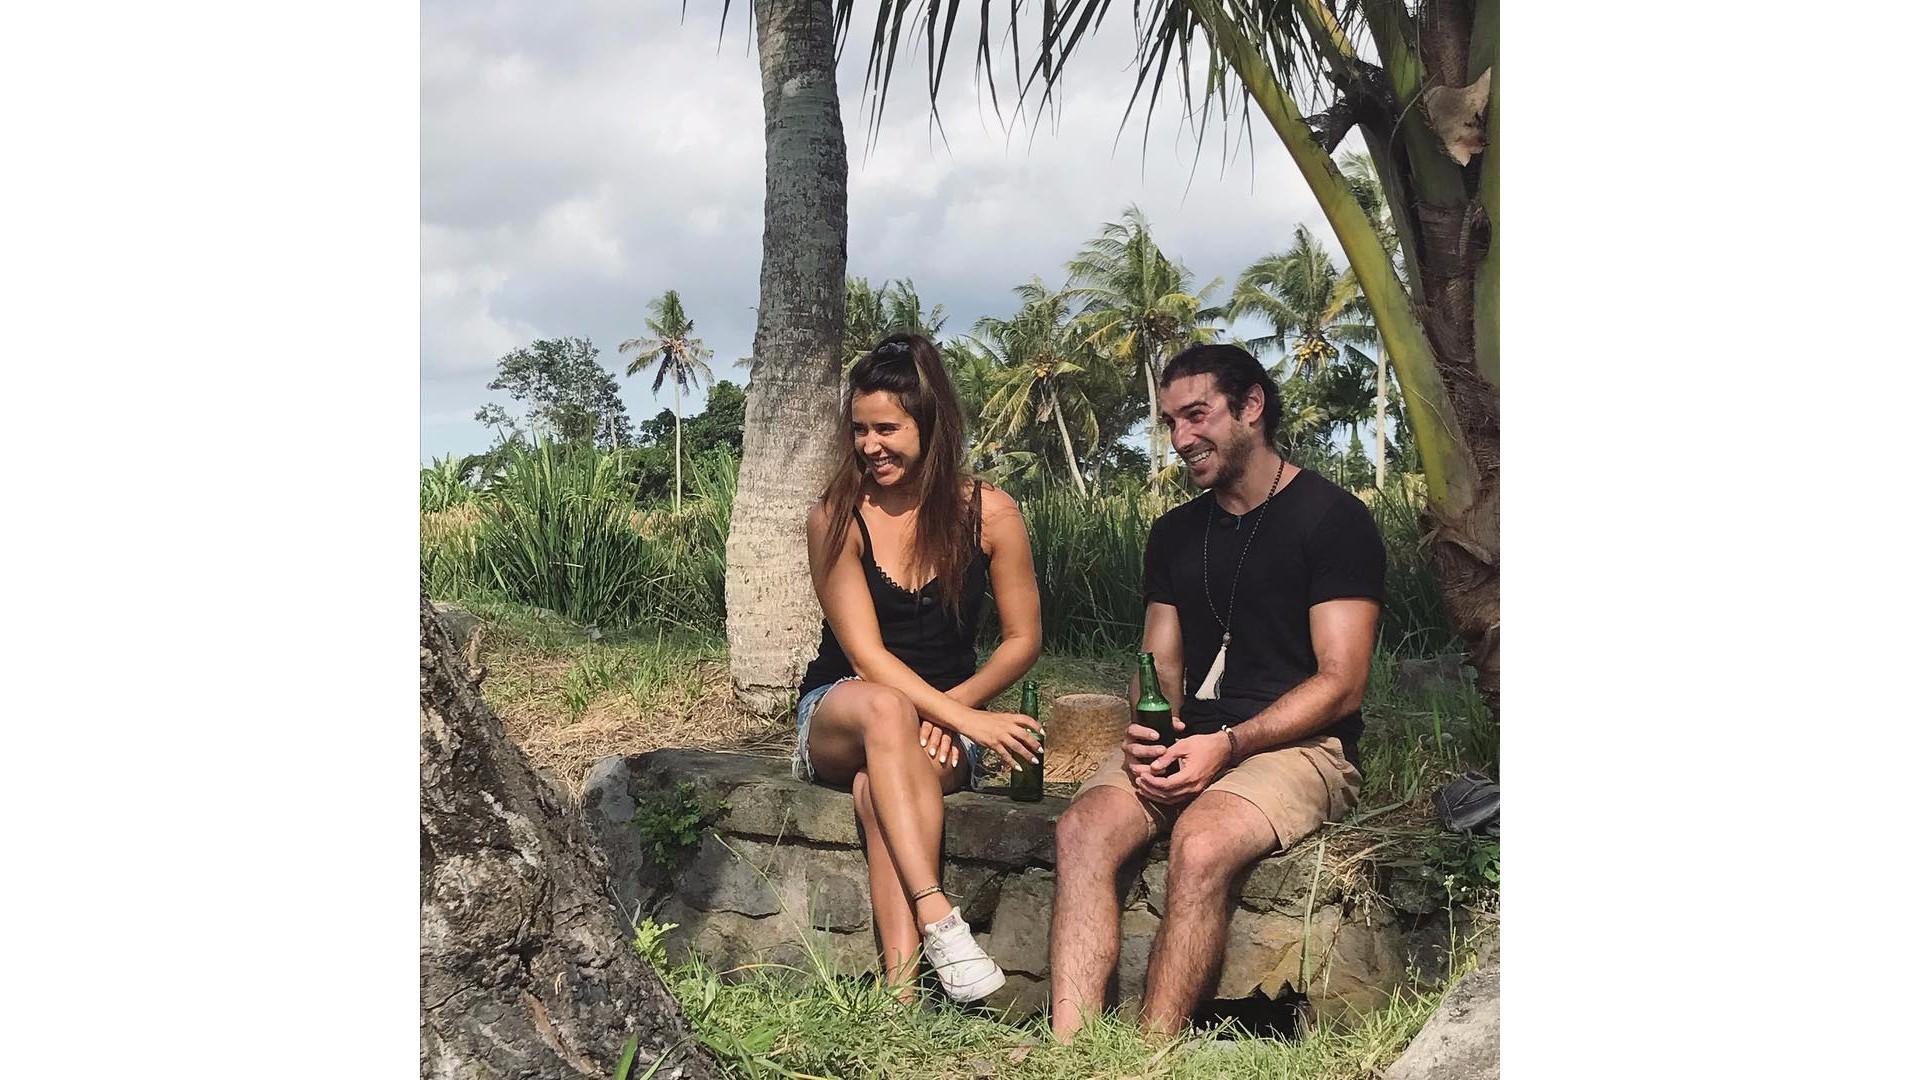 Alexandra et Adamo ont-ils du potentiel?